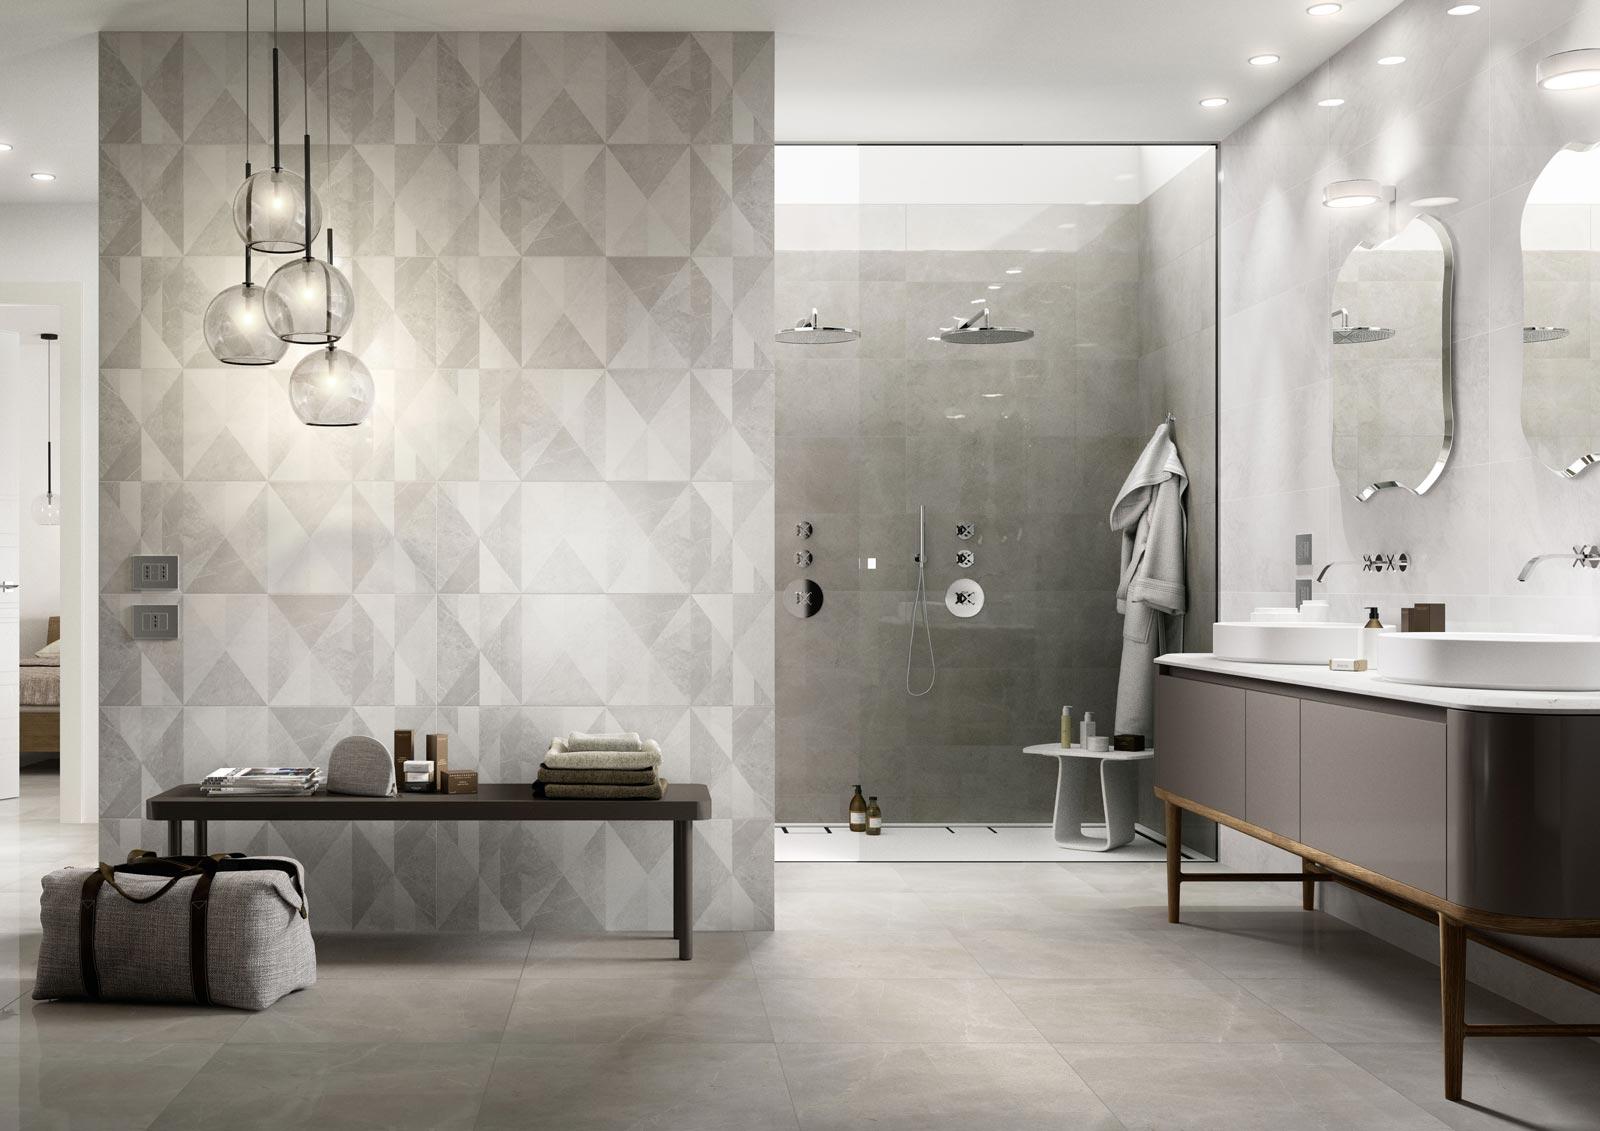 Piastrelle bagno milano affordable bagni with piastrelle bagno